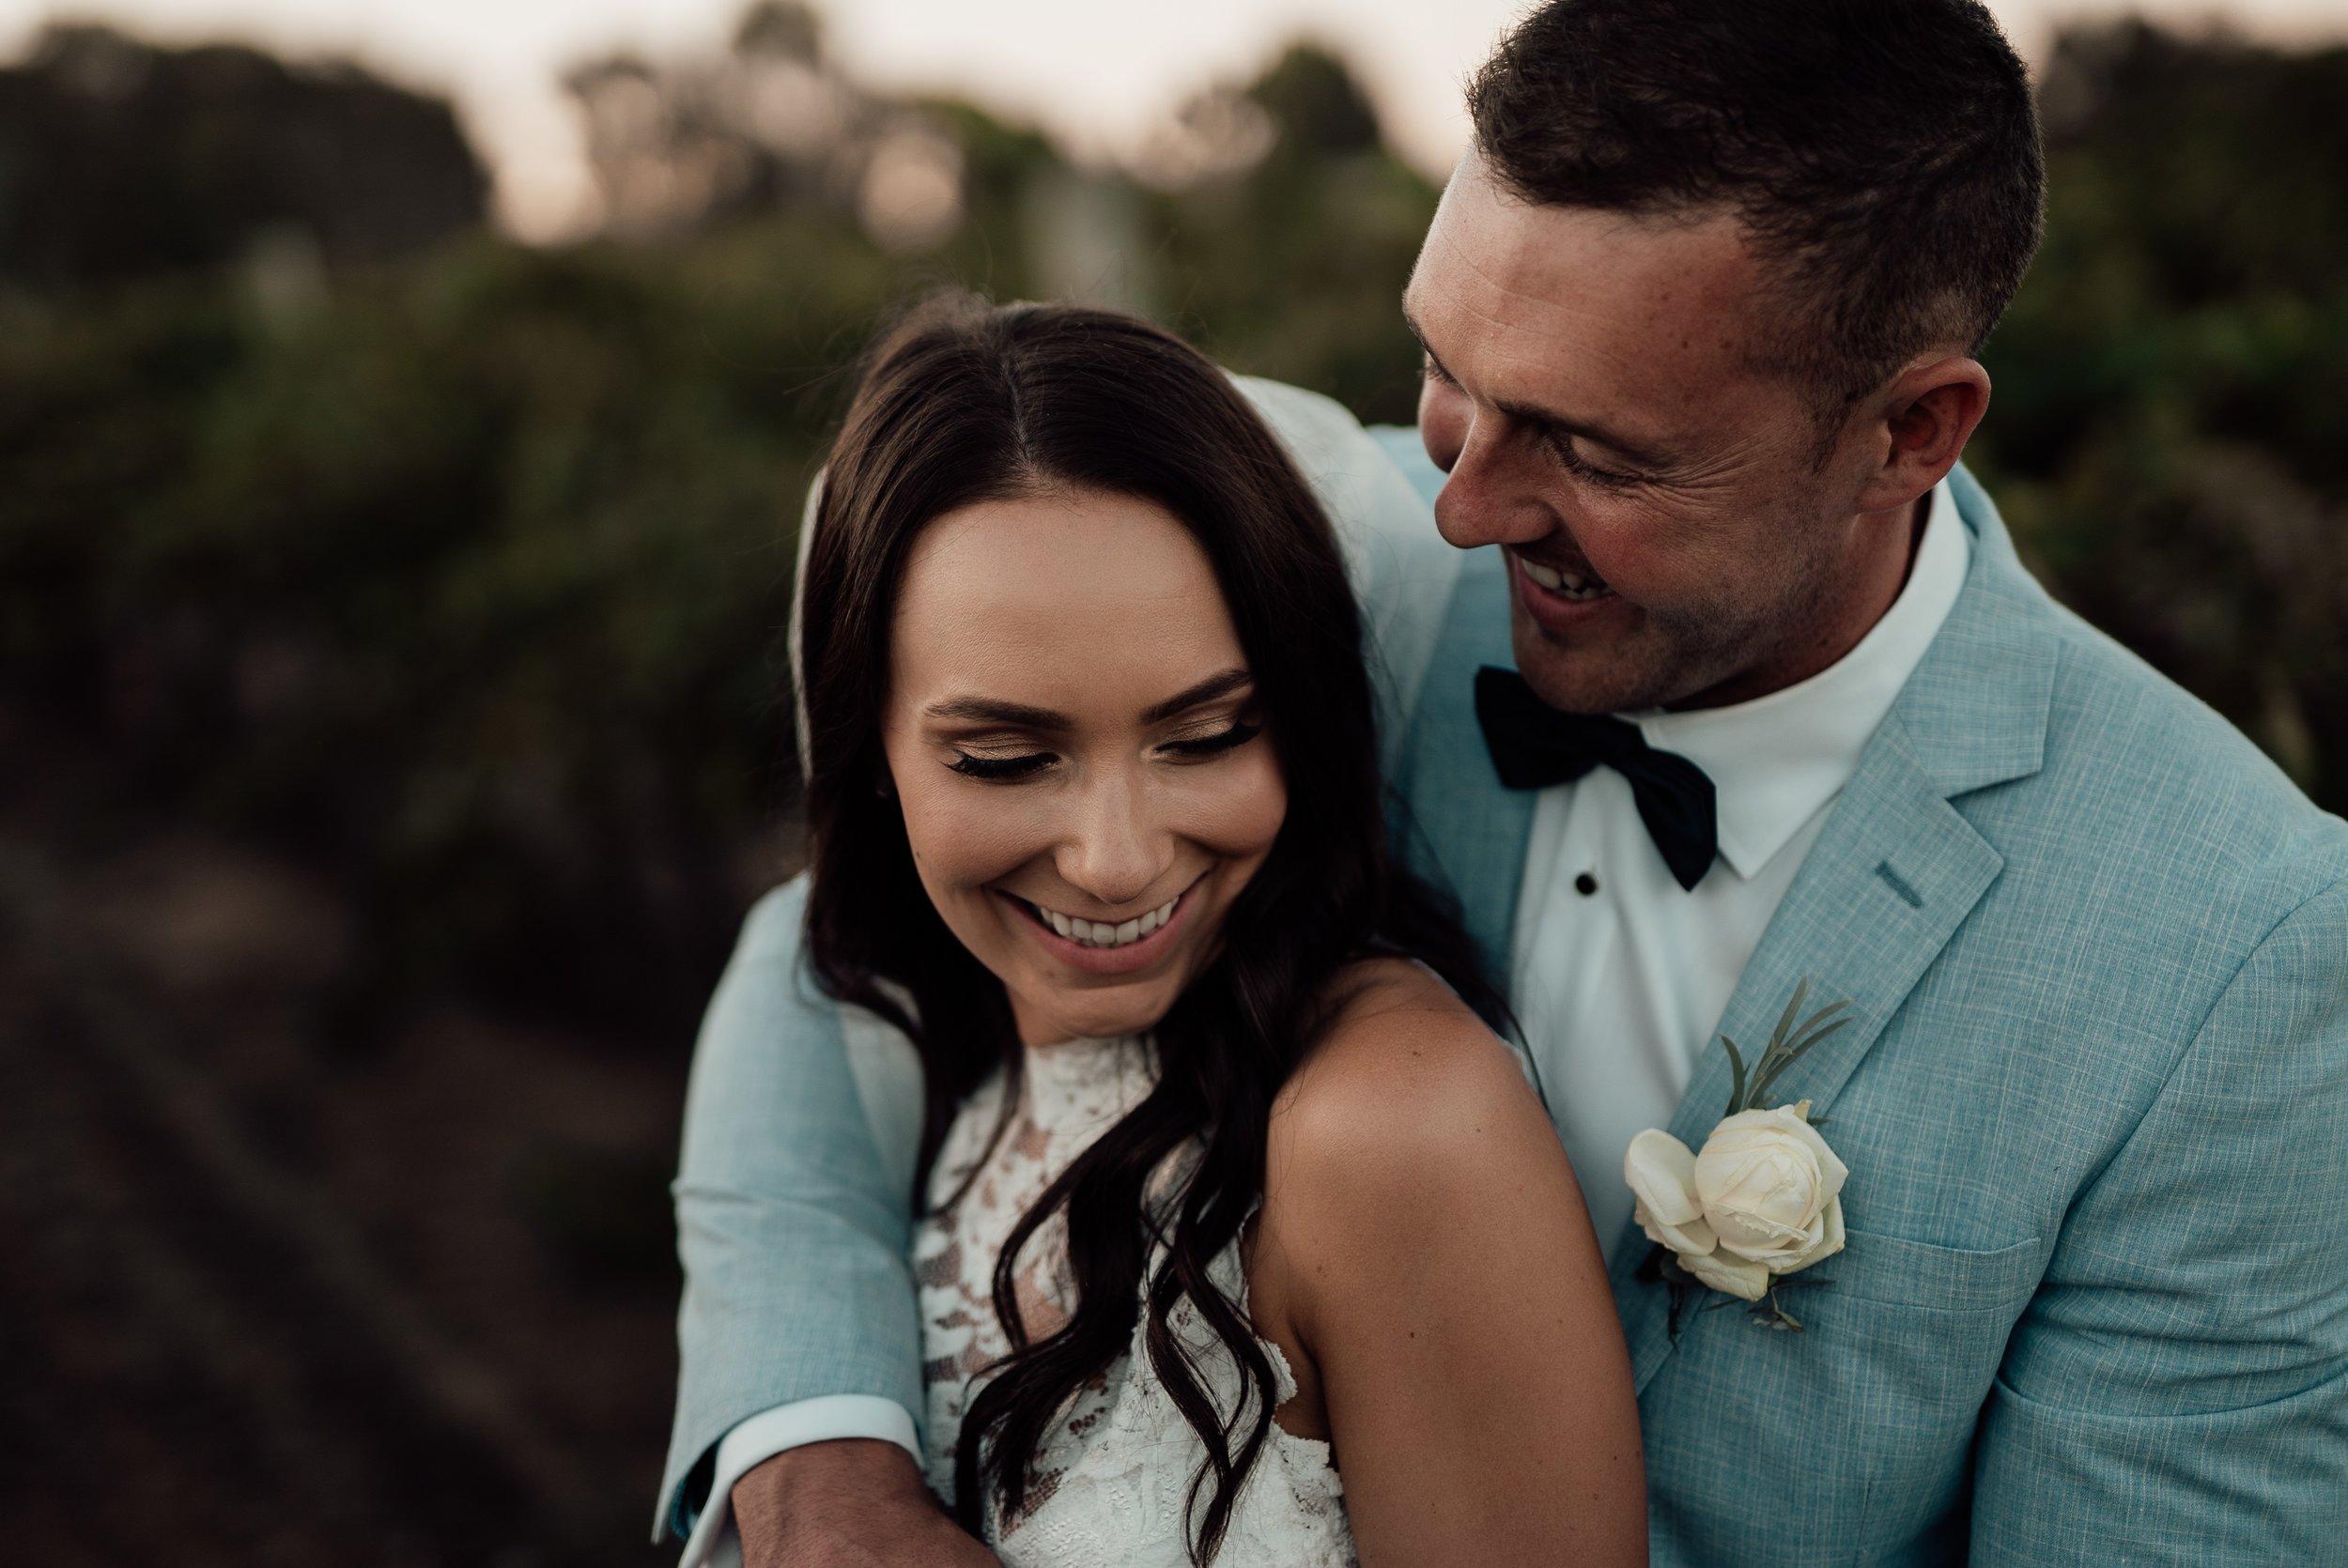 mickalathomas_puremacphotography_weddingphotographer_couplephotographer_Sheppartonphotographer_2917.jpg